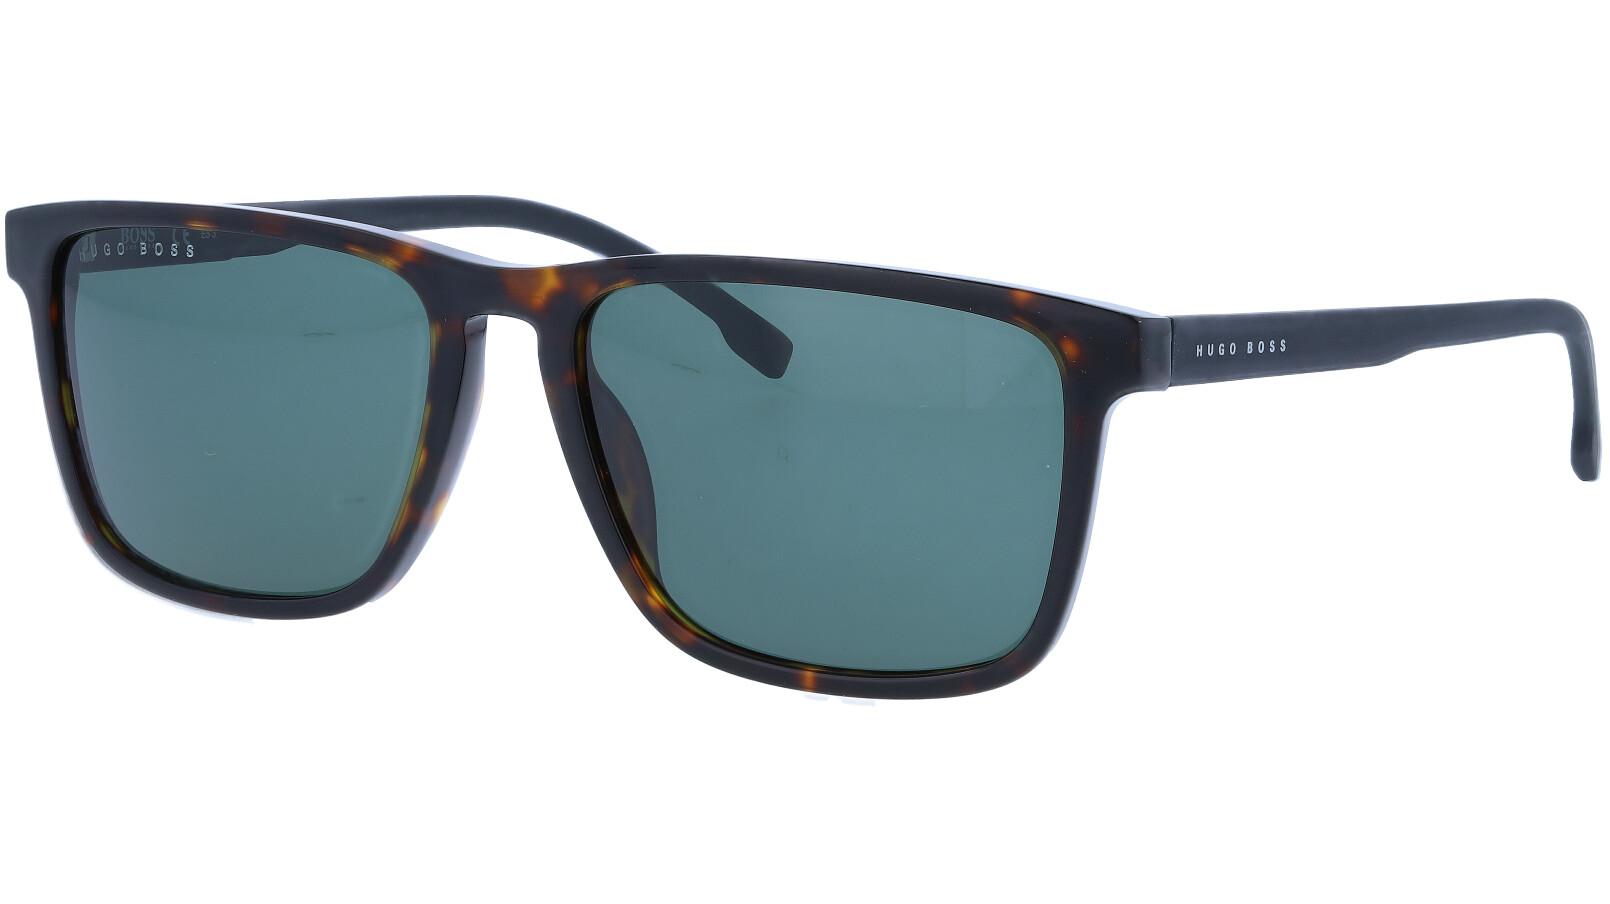 Hugo Boss BOSS0921S 086QT 55 Dark Sunglasses